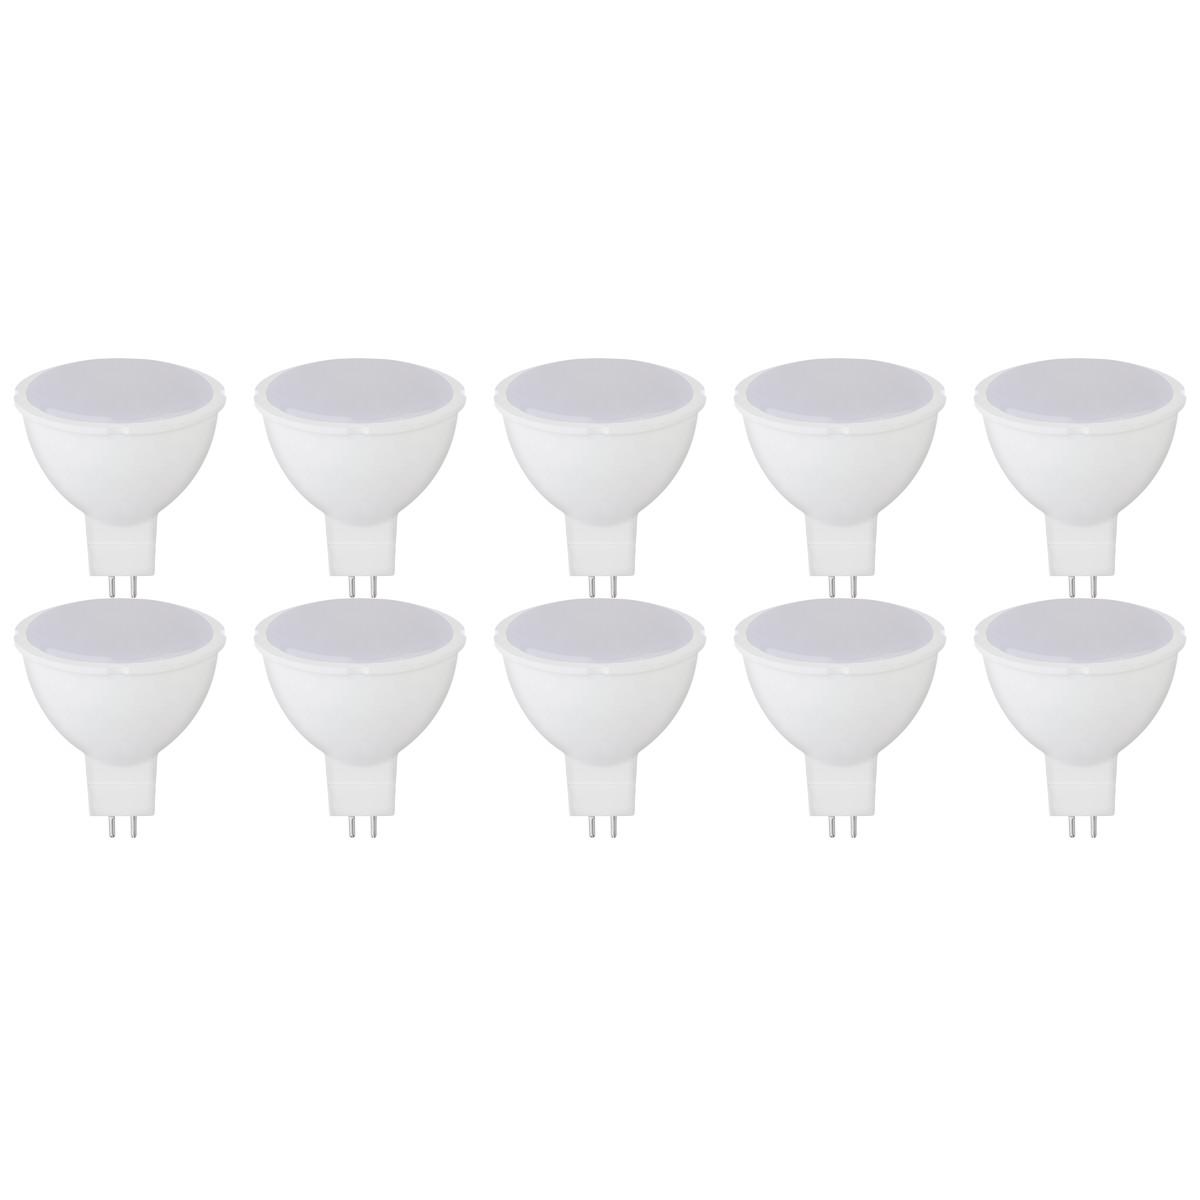 LED Spot 10 Pack - Fona - GU5.3 Fitting - 6W - Warm Wit 3000K - 230V